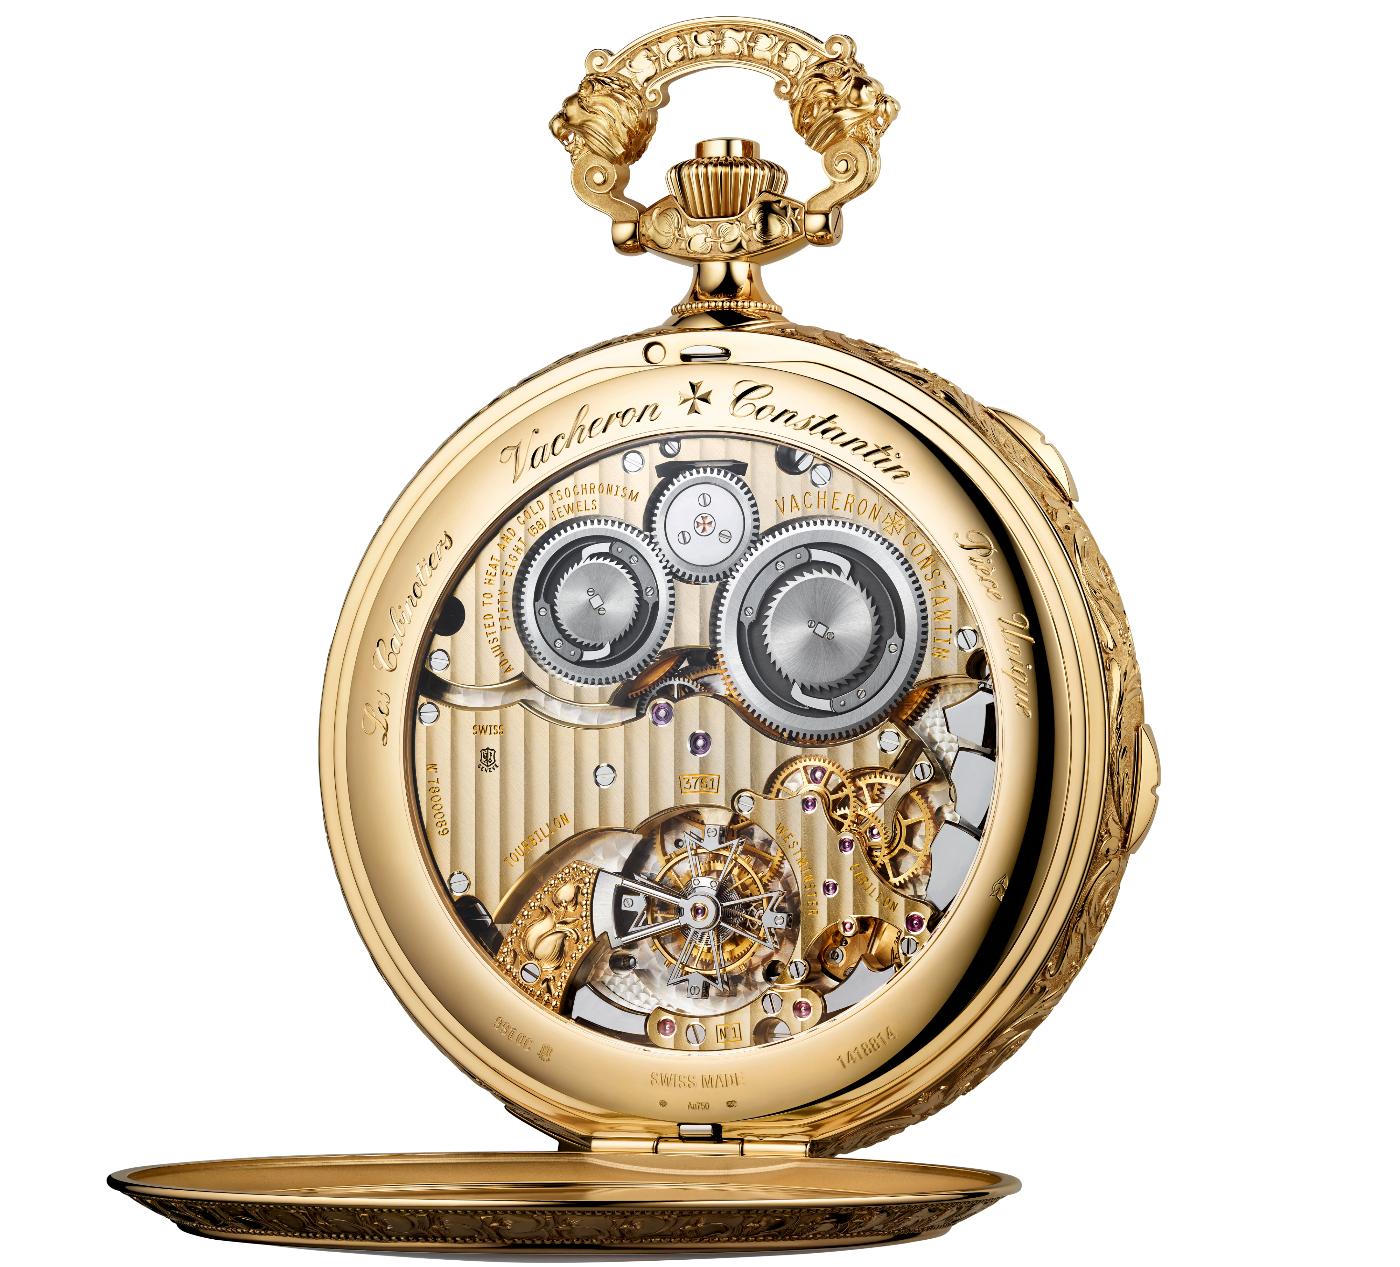 Vacheron Constantin unveils an exceptional bespoke pocket watch